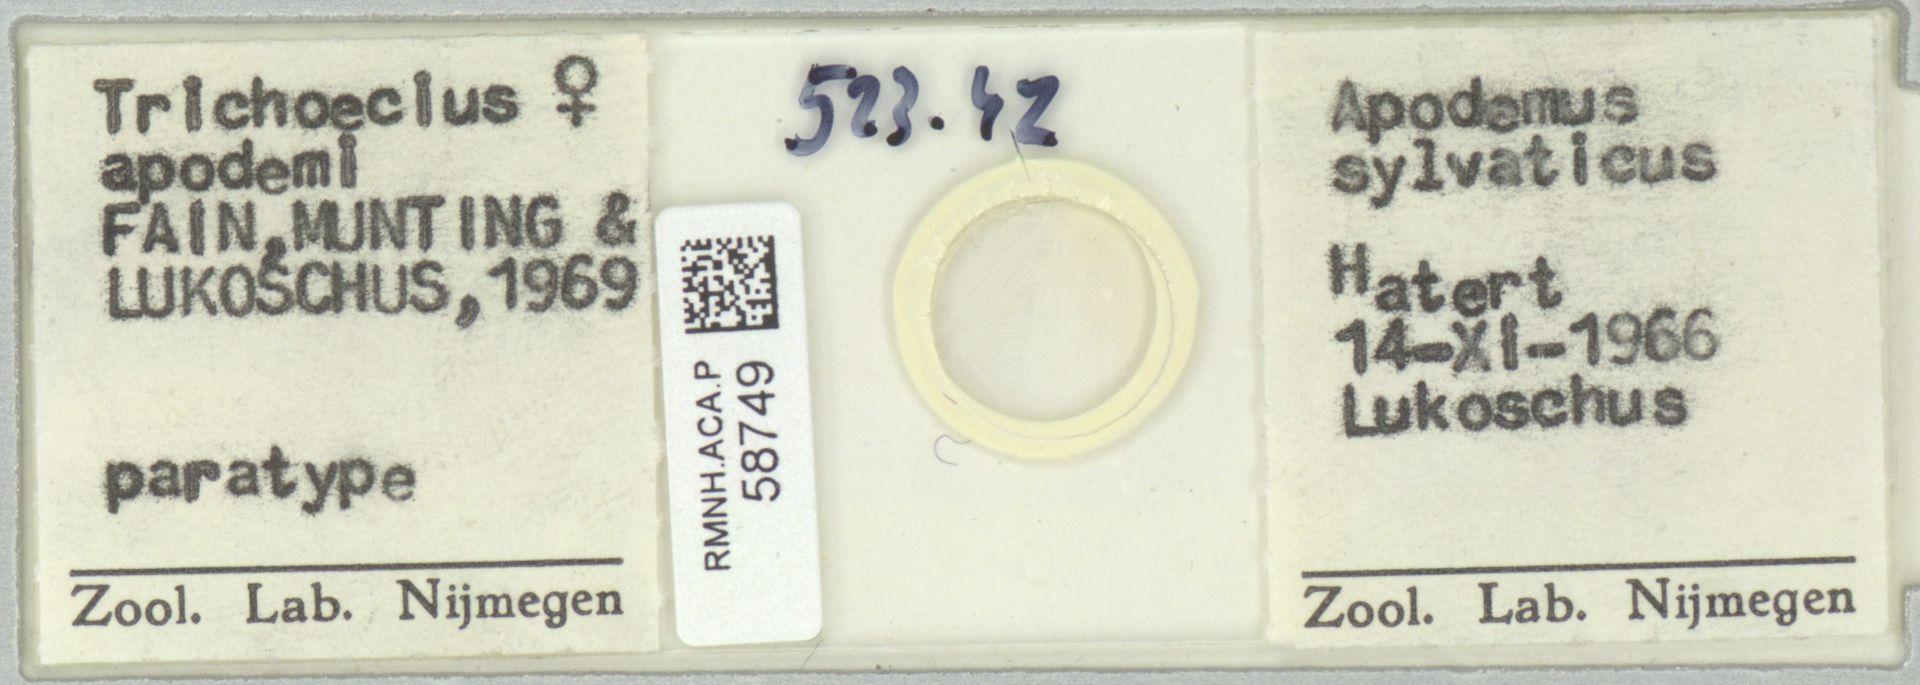 RMNH.ACA.P.58749   Trichoecius apodemi Fain, Munting & Lukoschus, 1969